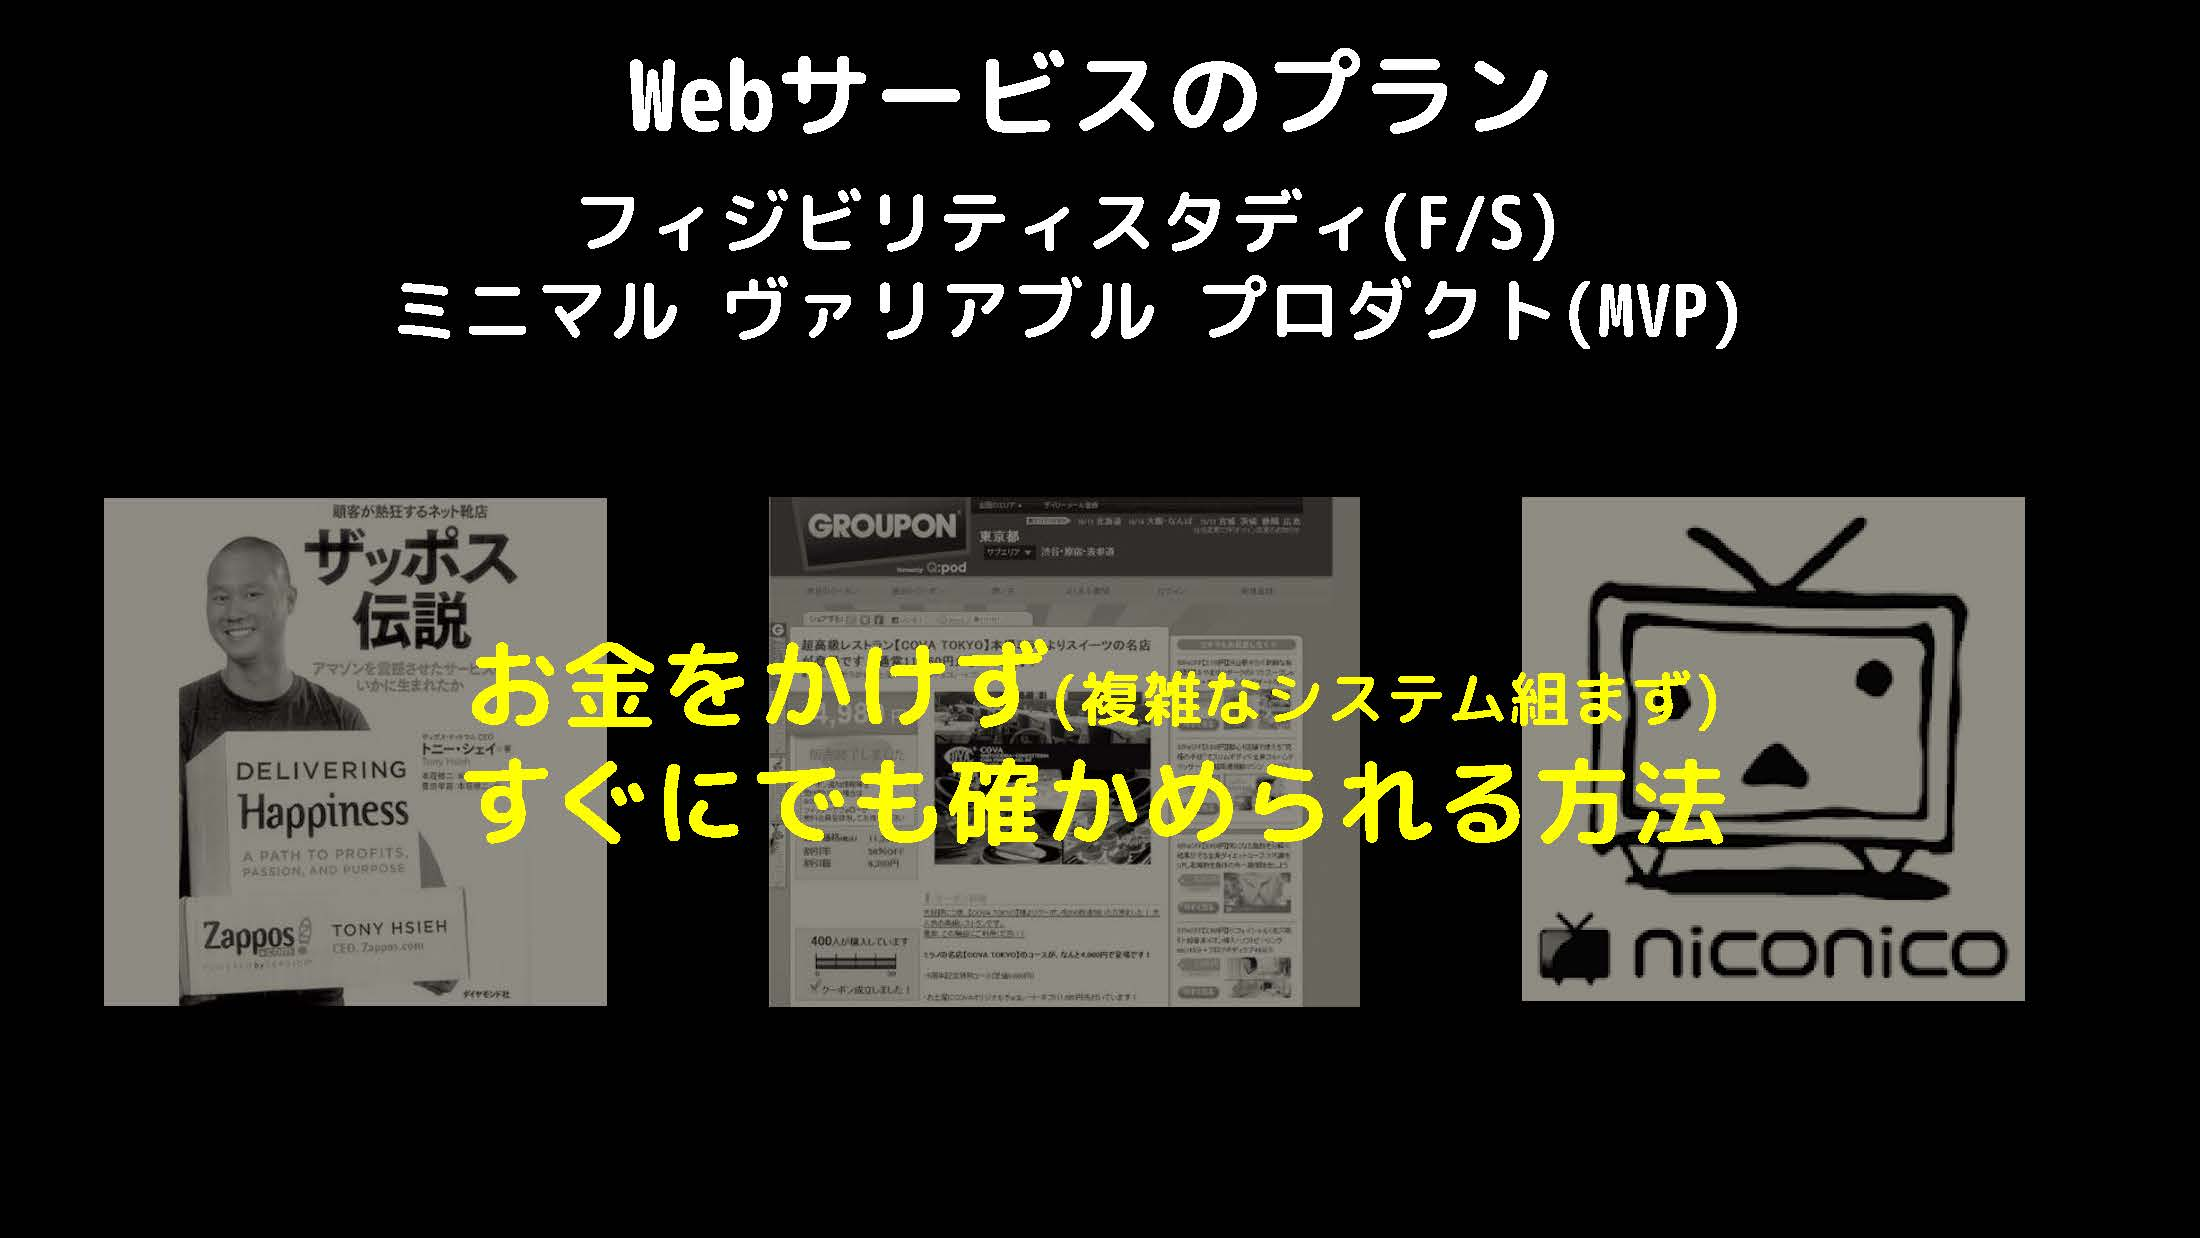 web-160911152159_%e3%83%9a%e3%83%bc%e3%82%b8_47